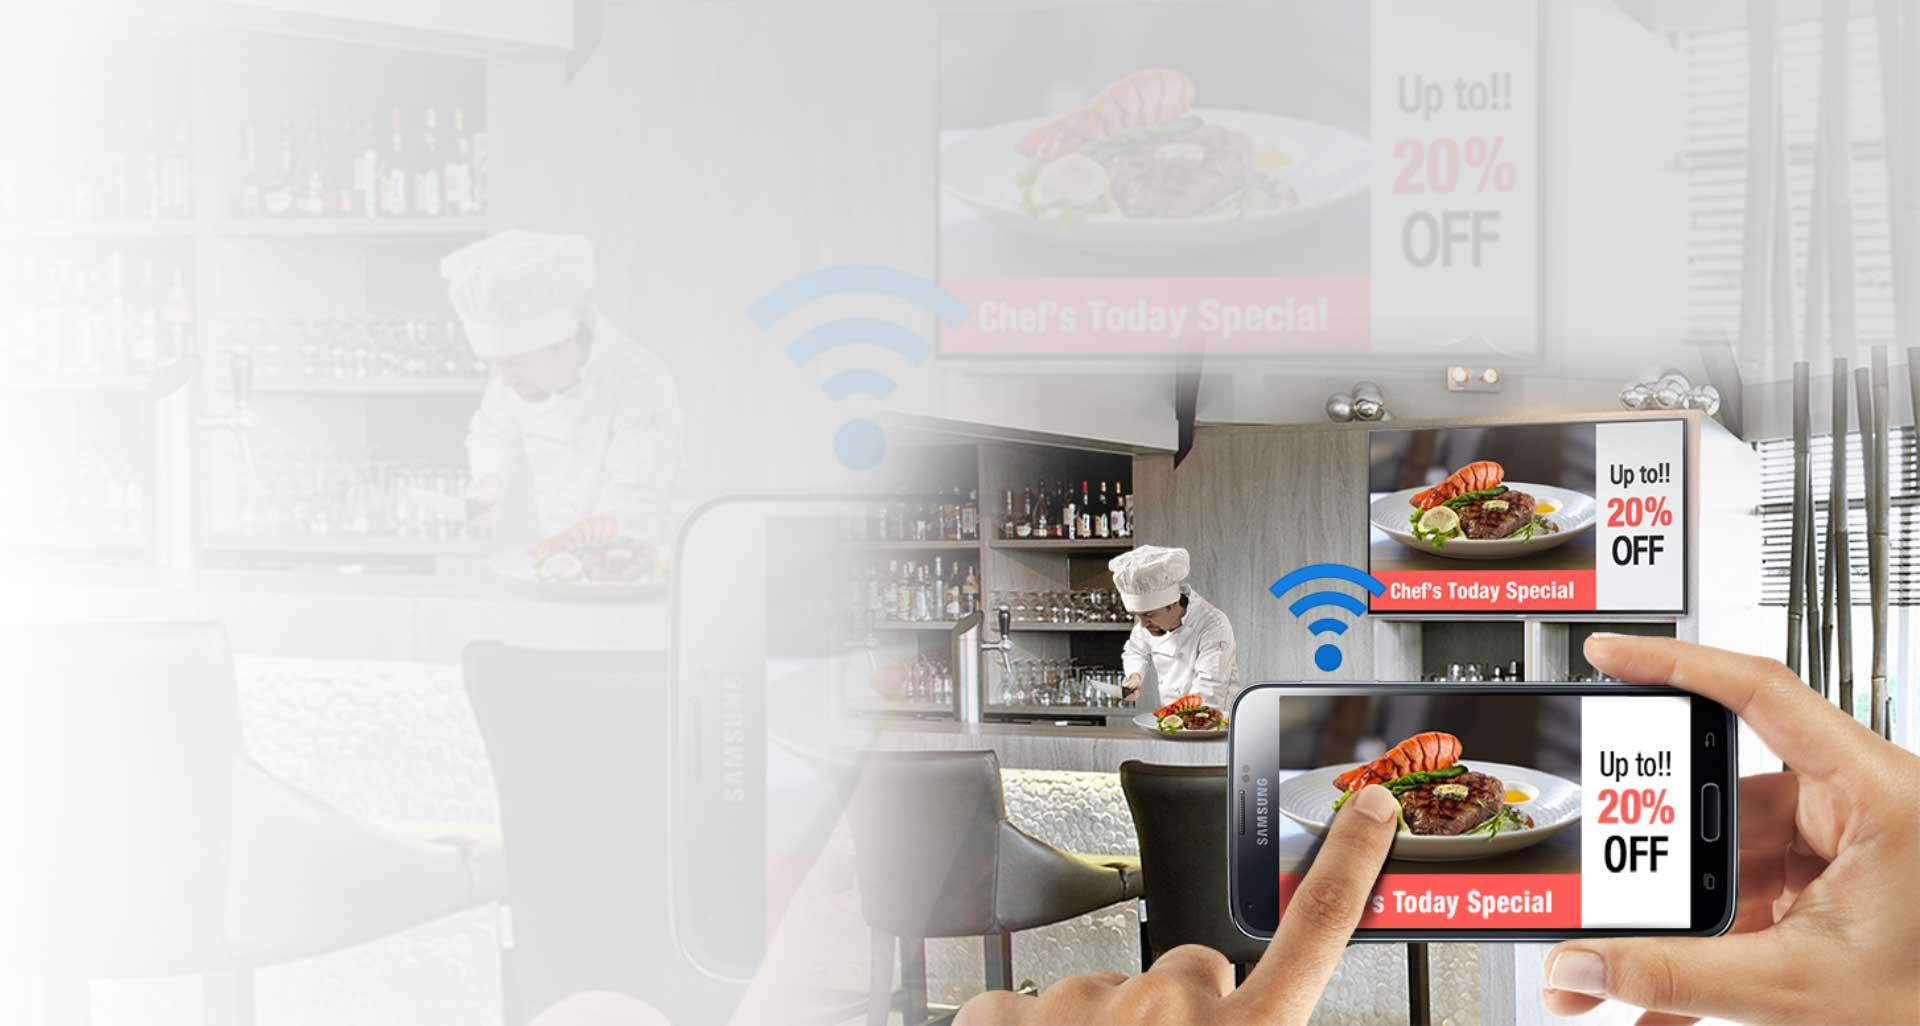 samsung 2 RMD - تلویزیون هوشمند ساینیج 48 اینچ سامسونگ Samsung Smart Signage TV RM48D